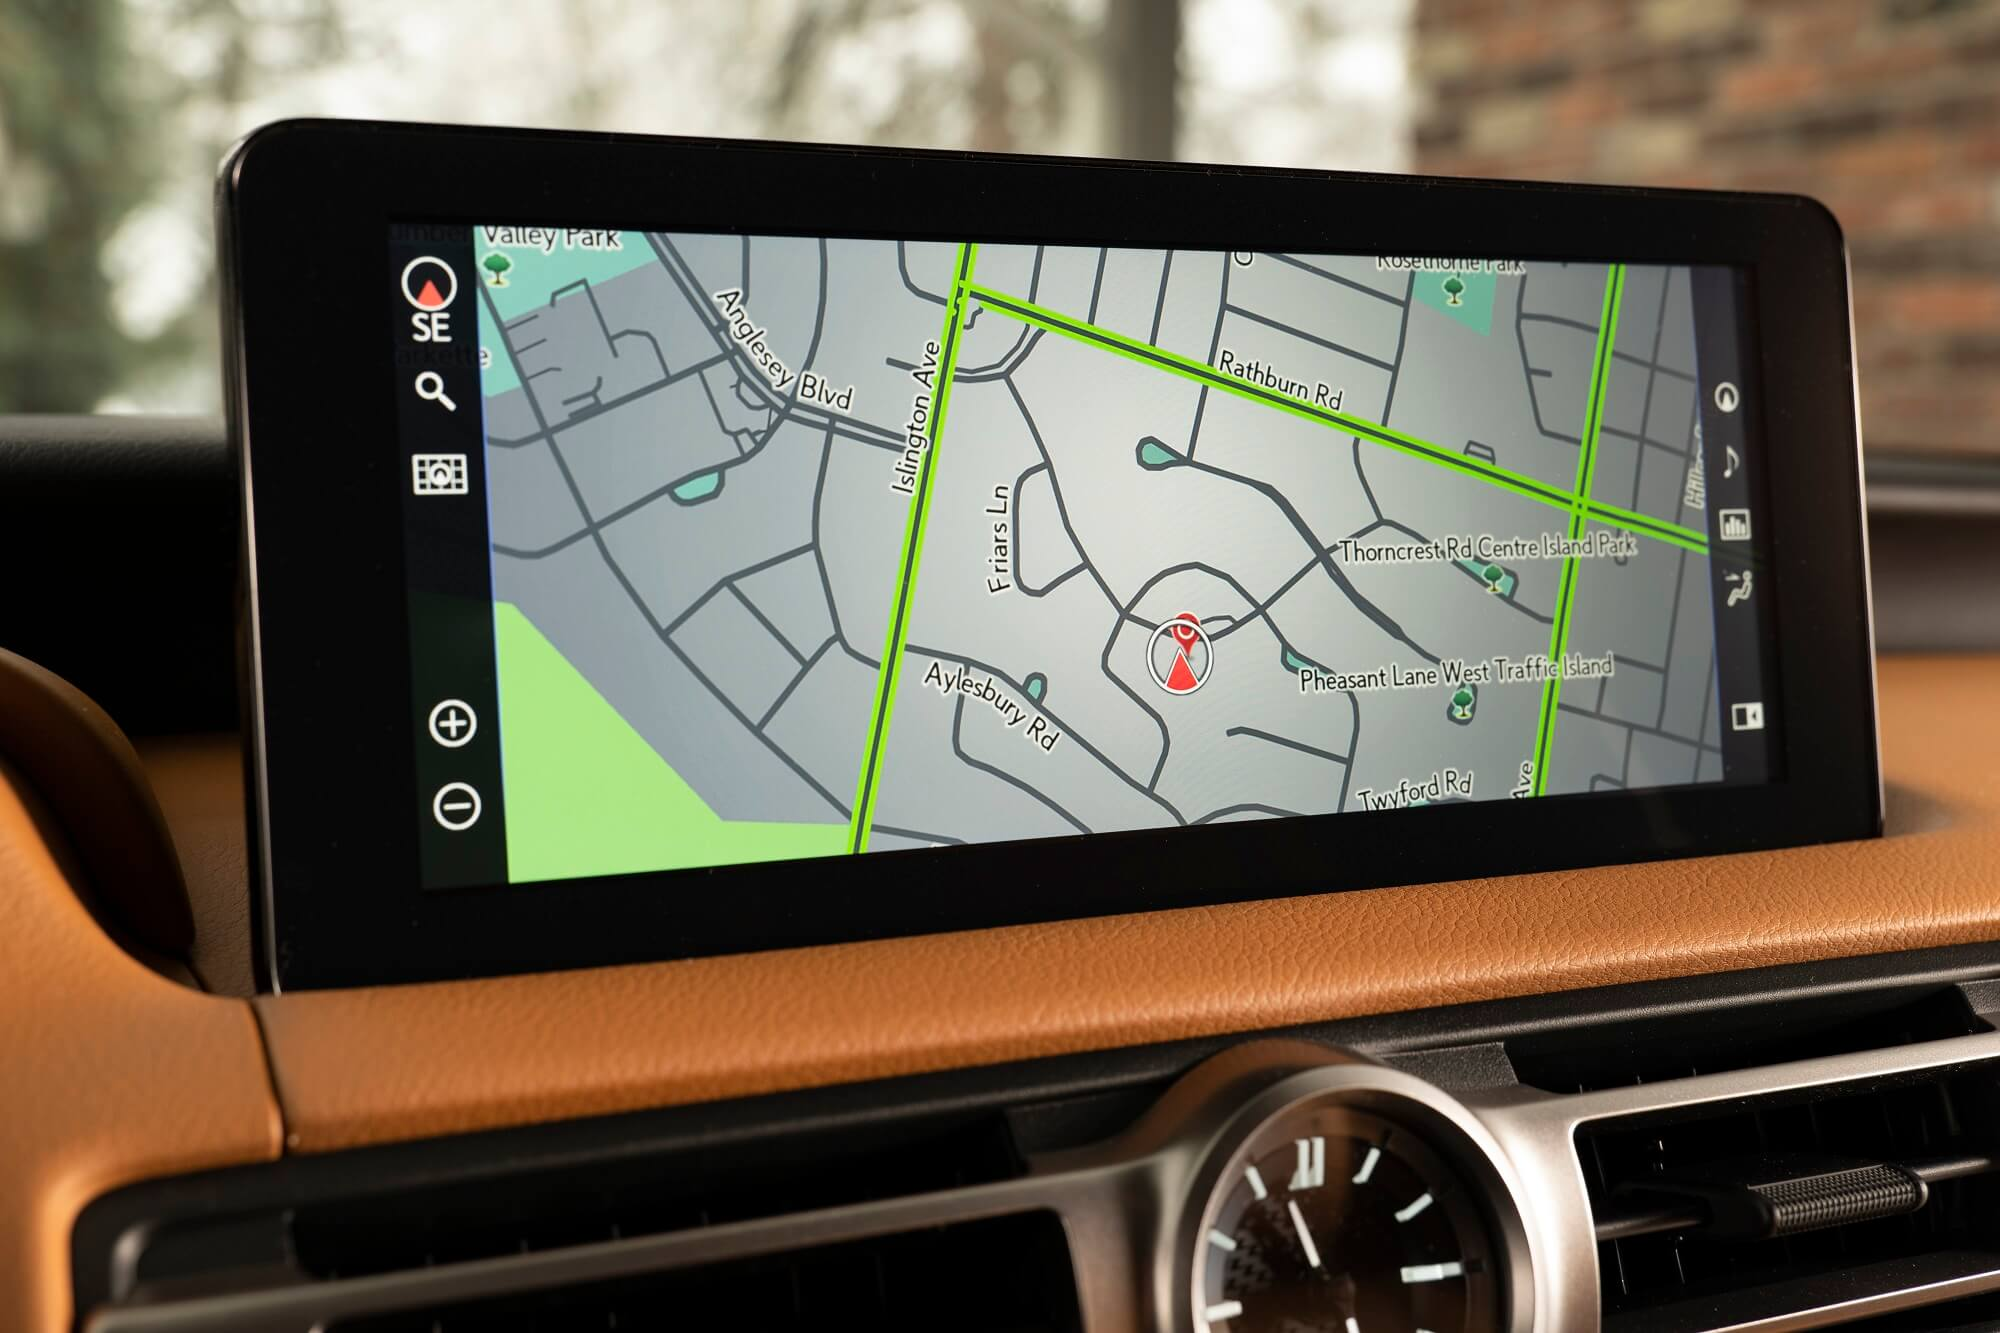 Lexus sistema de navegação